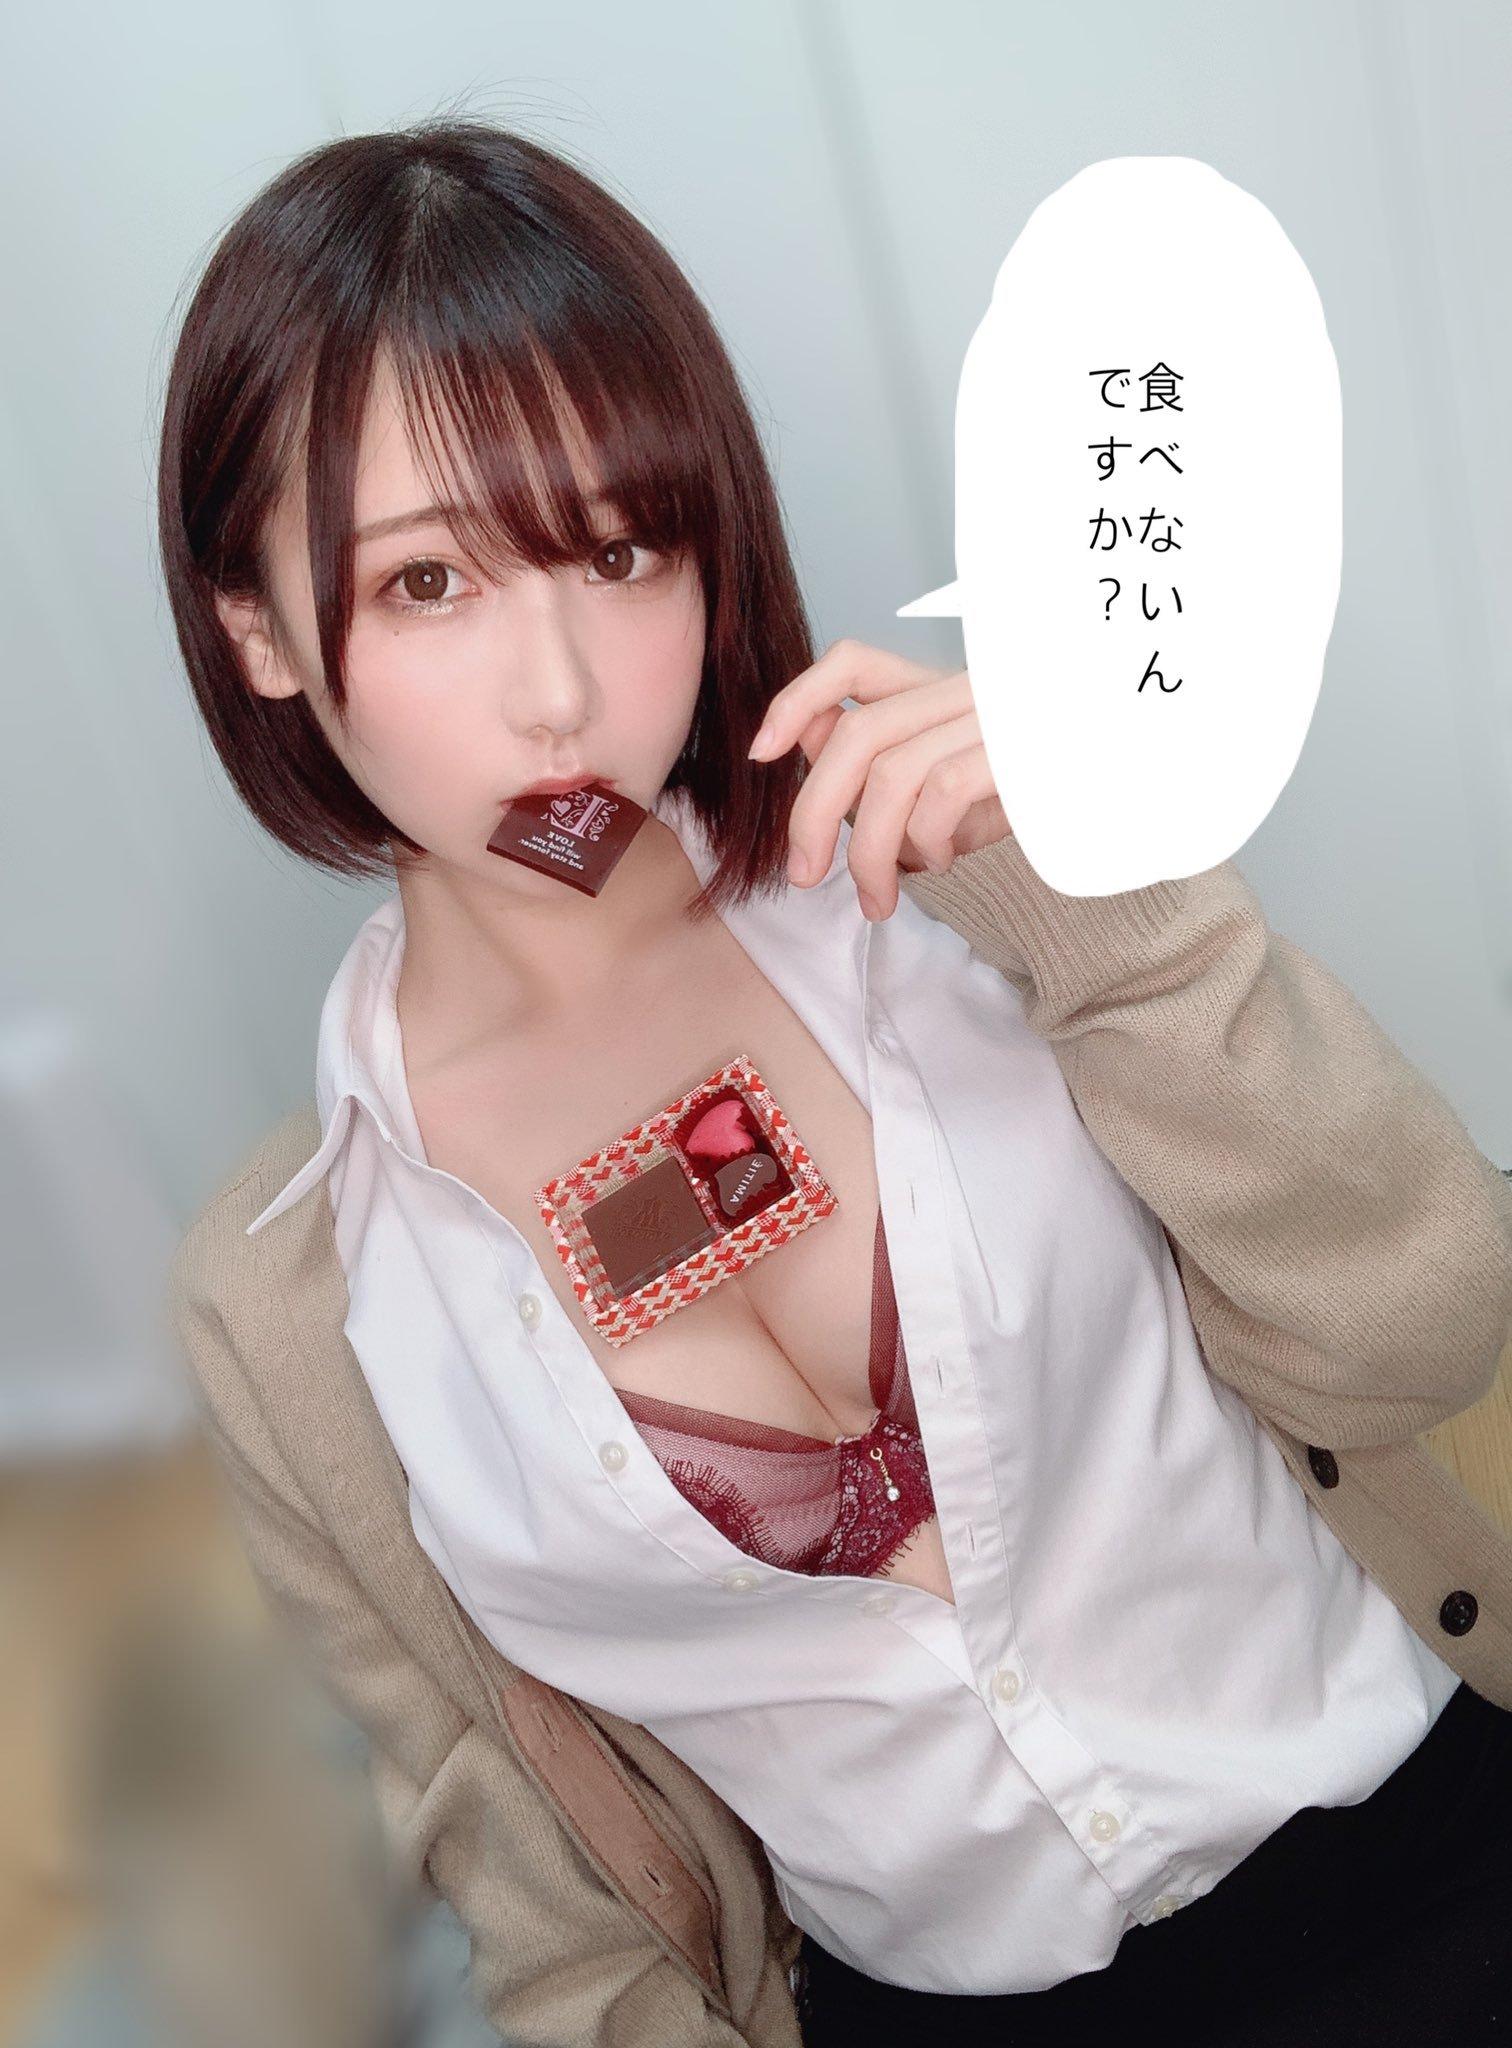 COS精选 巧克力